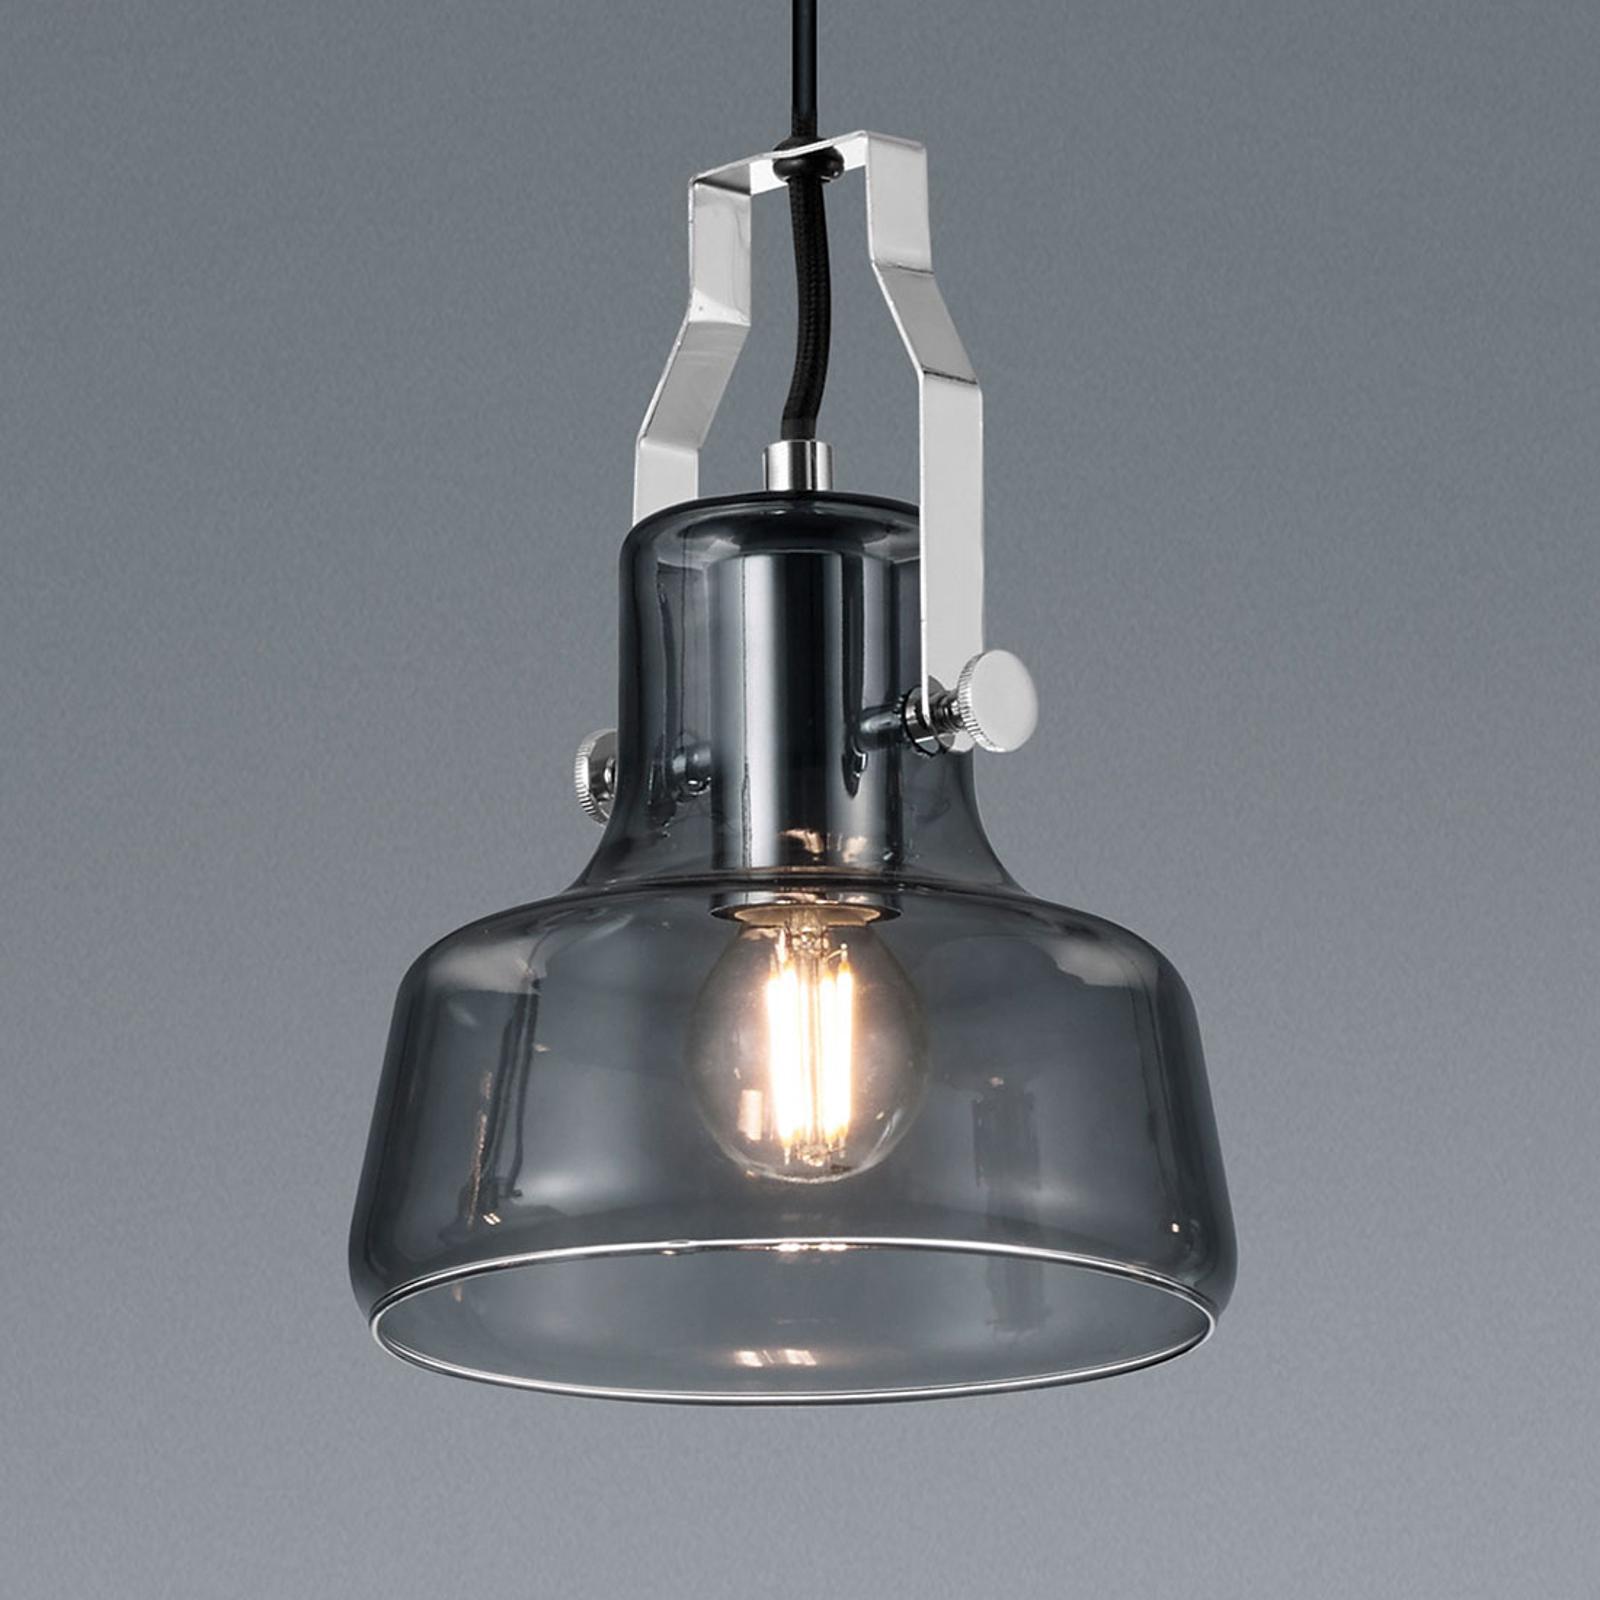 Lampa wisząca Kolani ze szklanym kloszem 1pkt